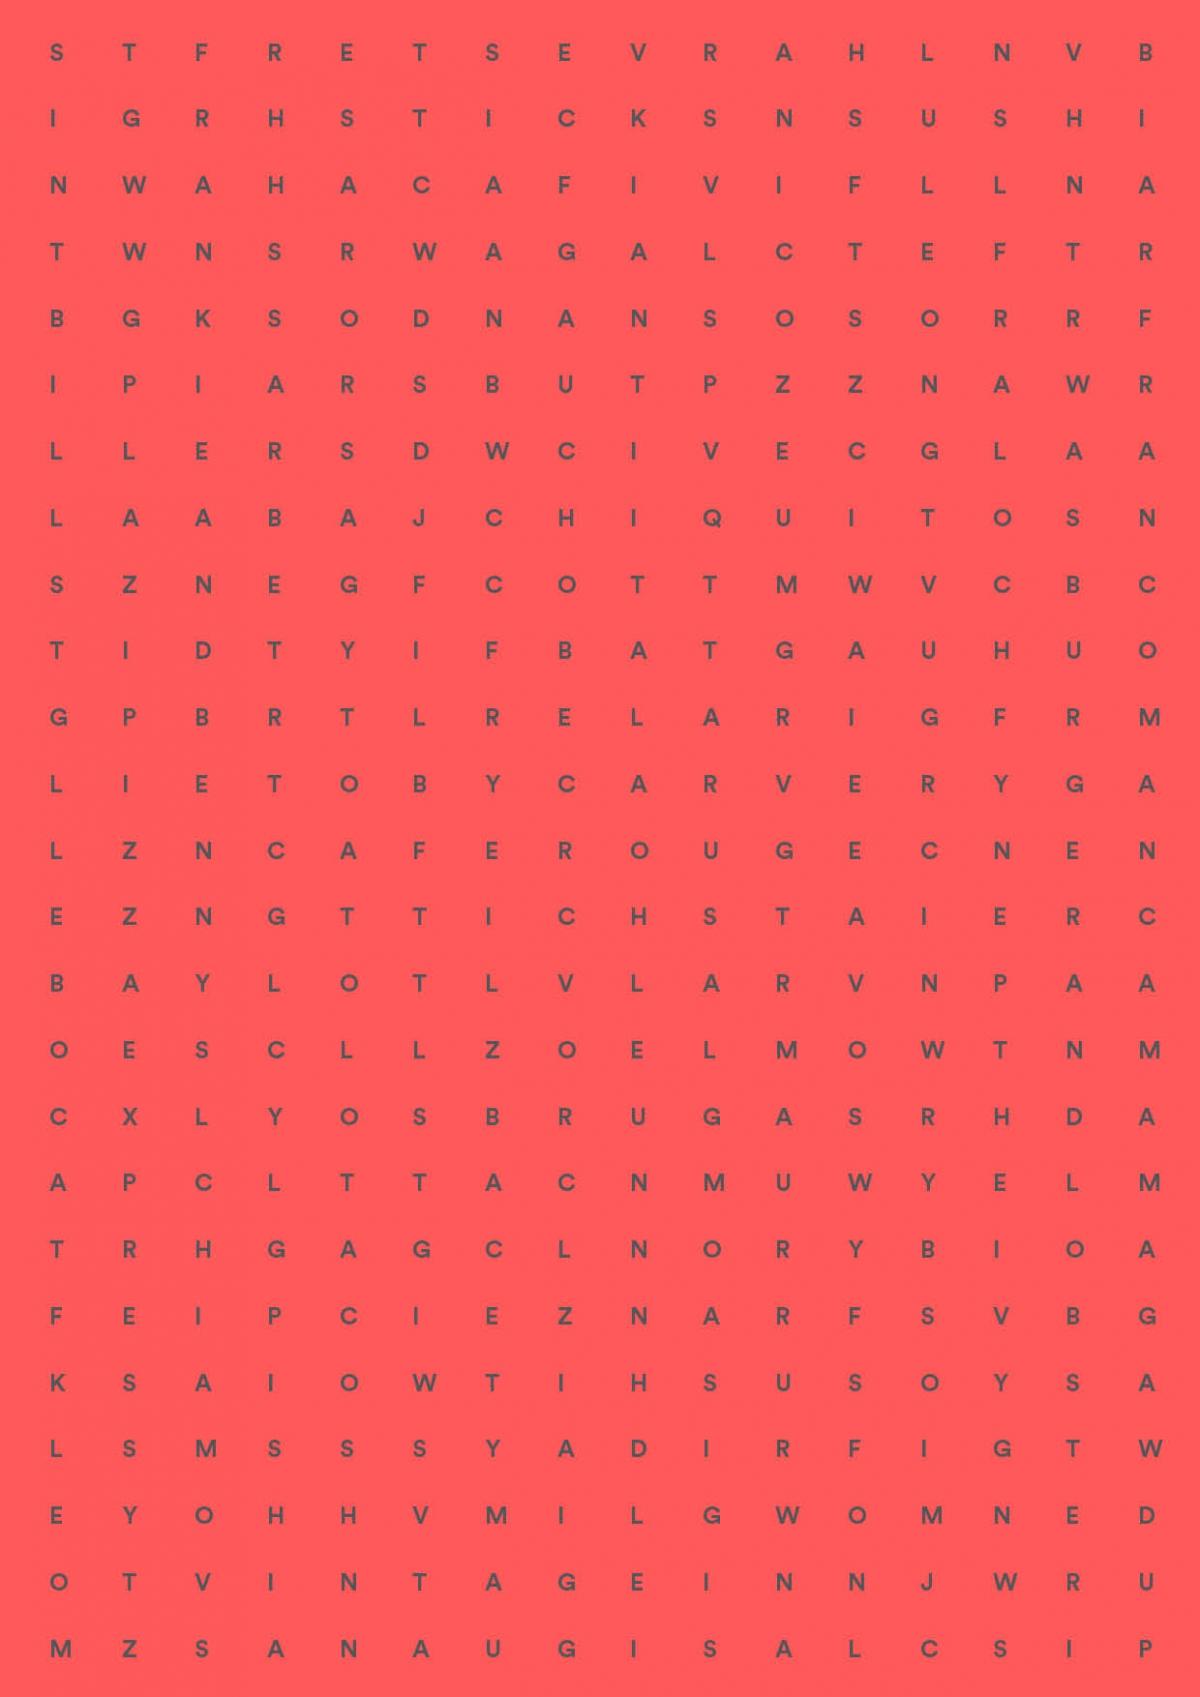 Paul_Crossword